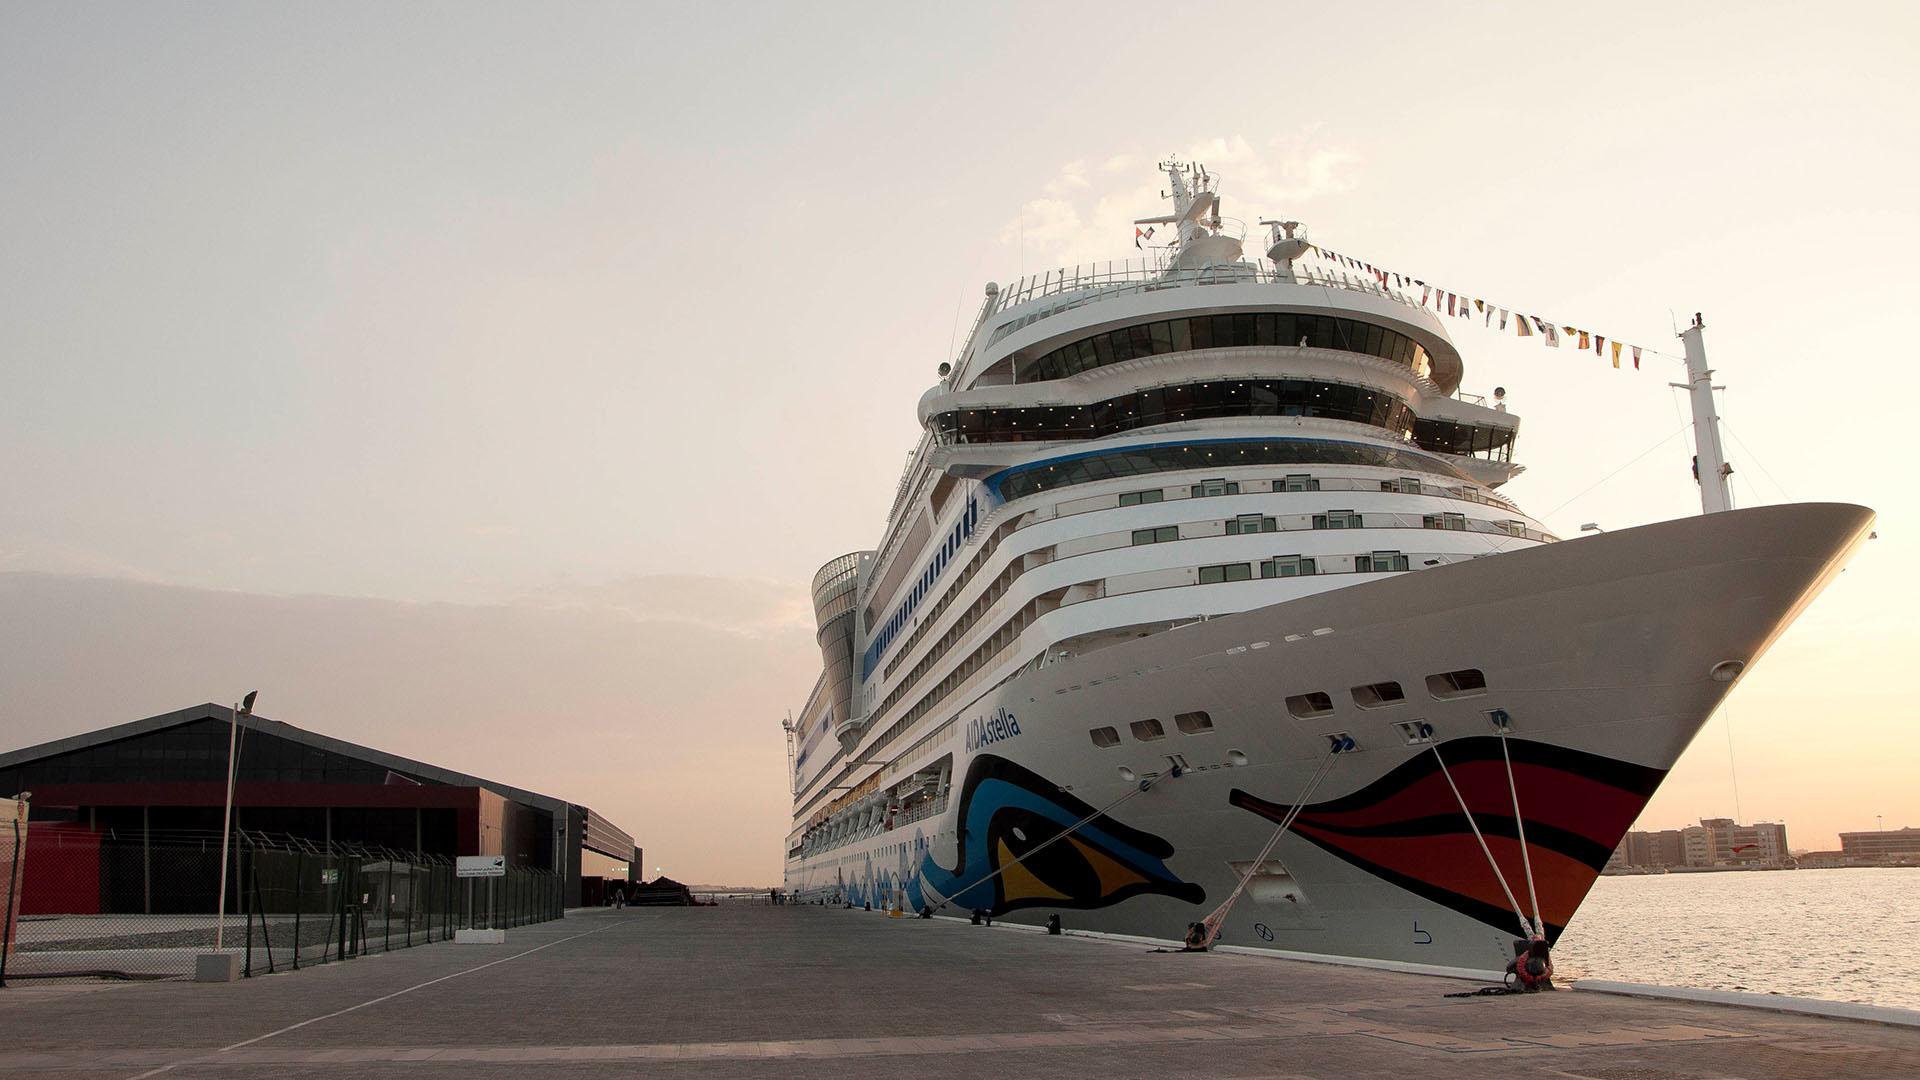 Die AIDAstella in Abu Dhabi. Foto: AIDA Cruises